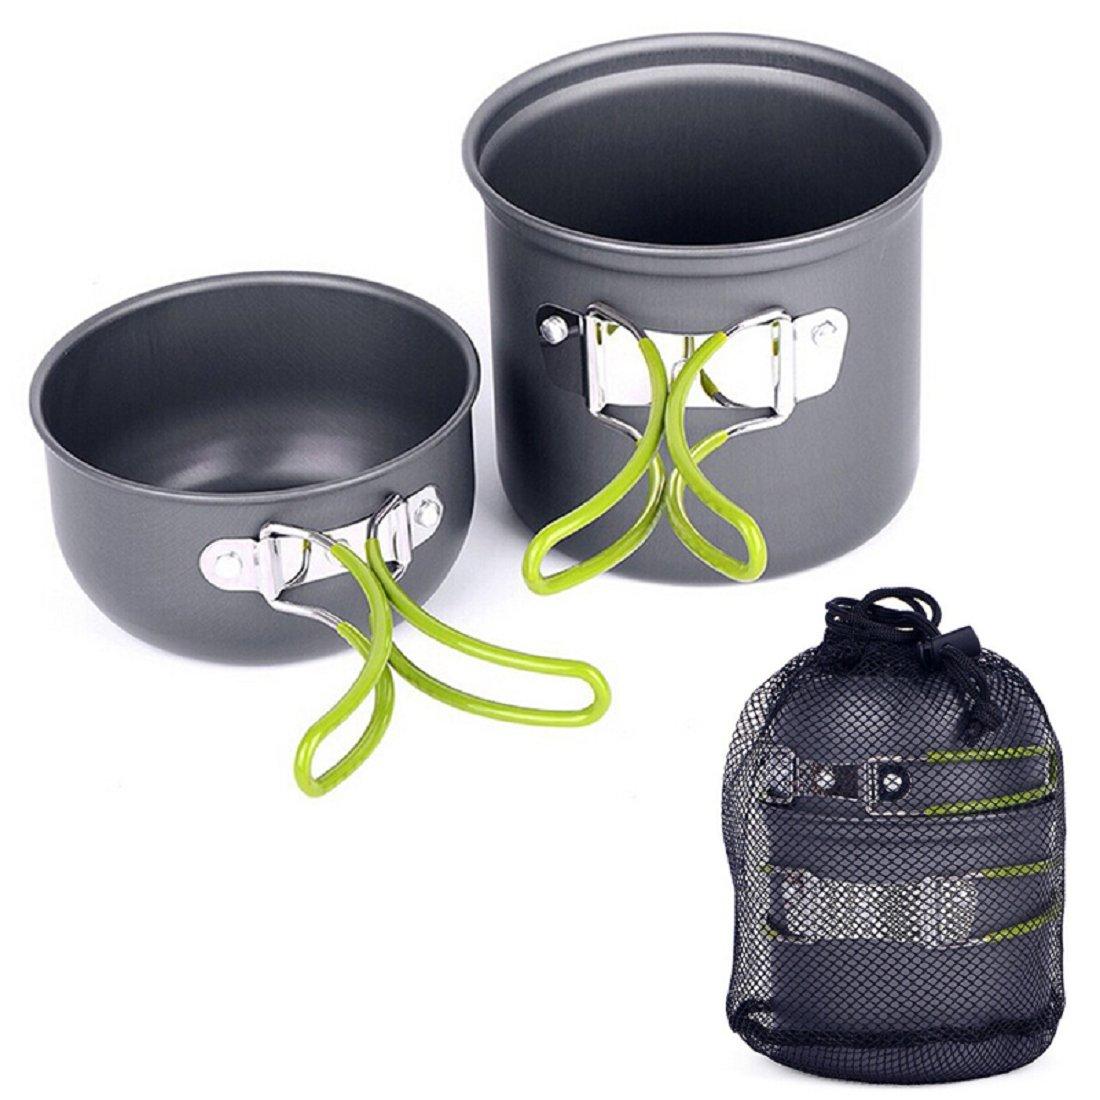 Shensee Camping Hiking Picnic Cookware Cook Pot Bowl Set Aluminum Outdoor